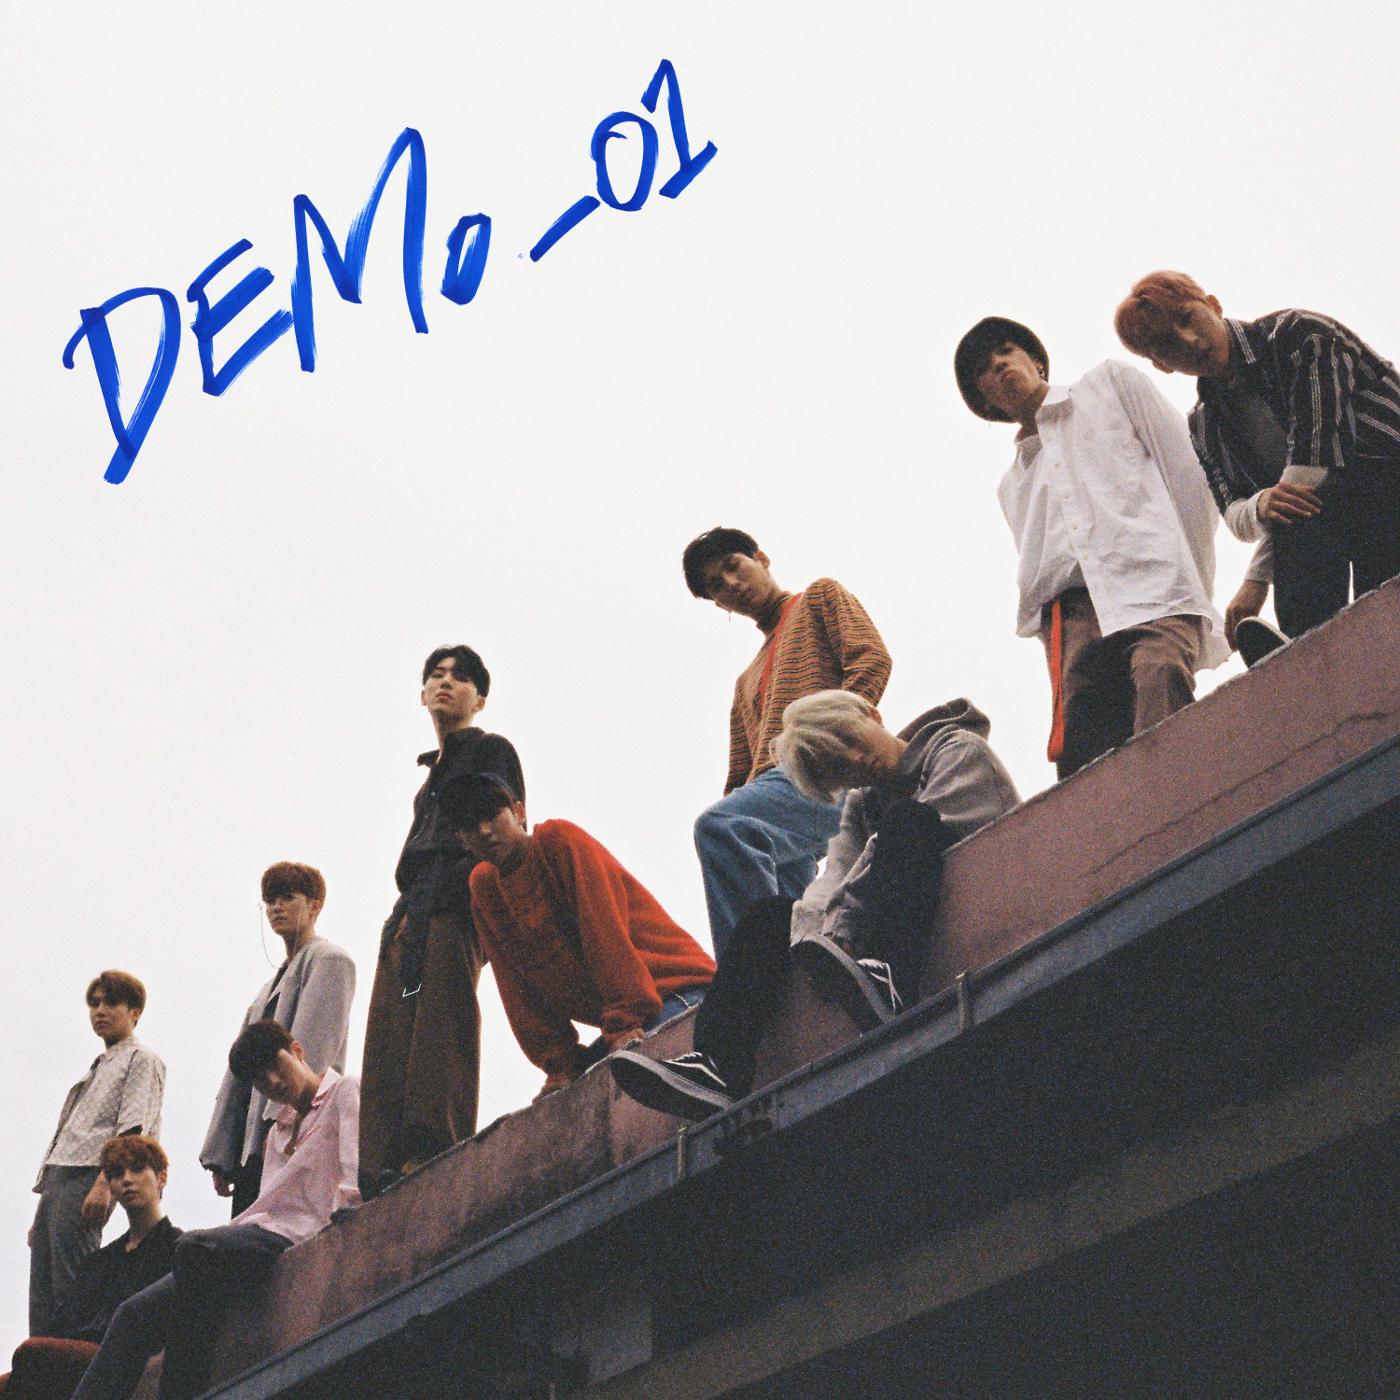 Demo 01